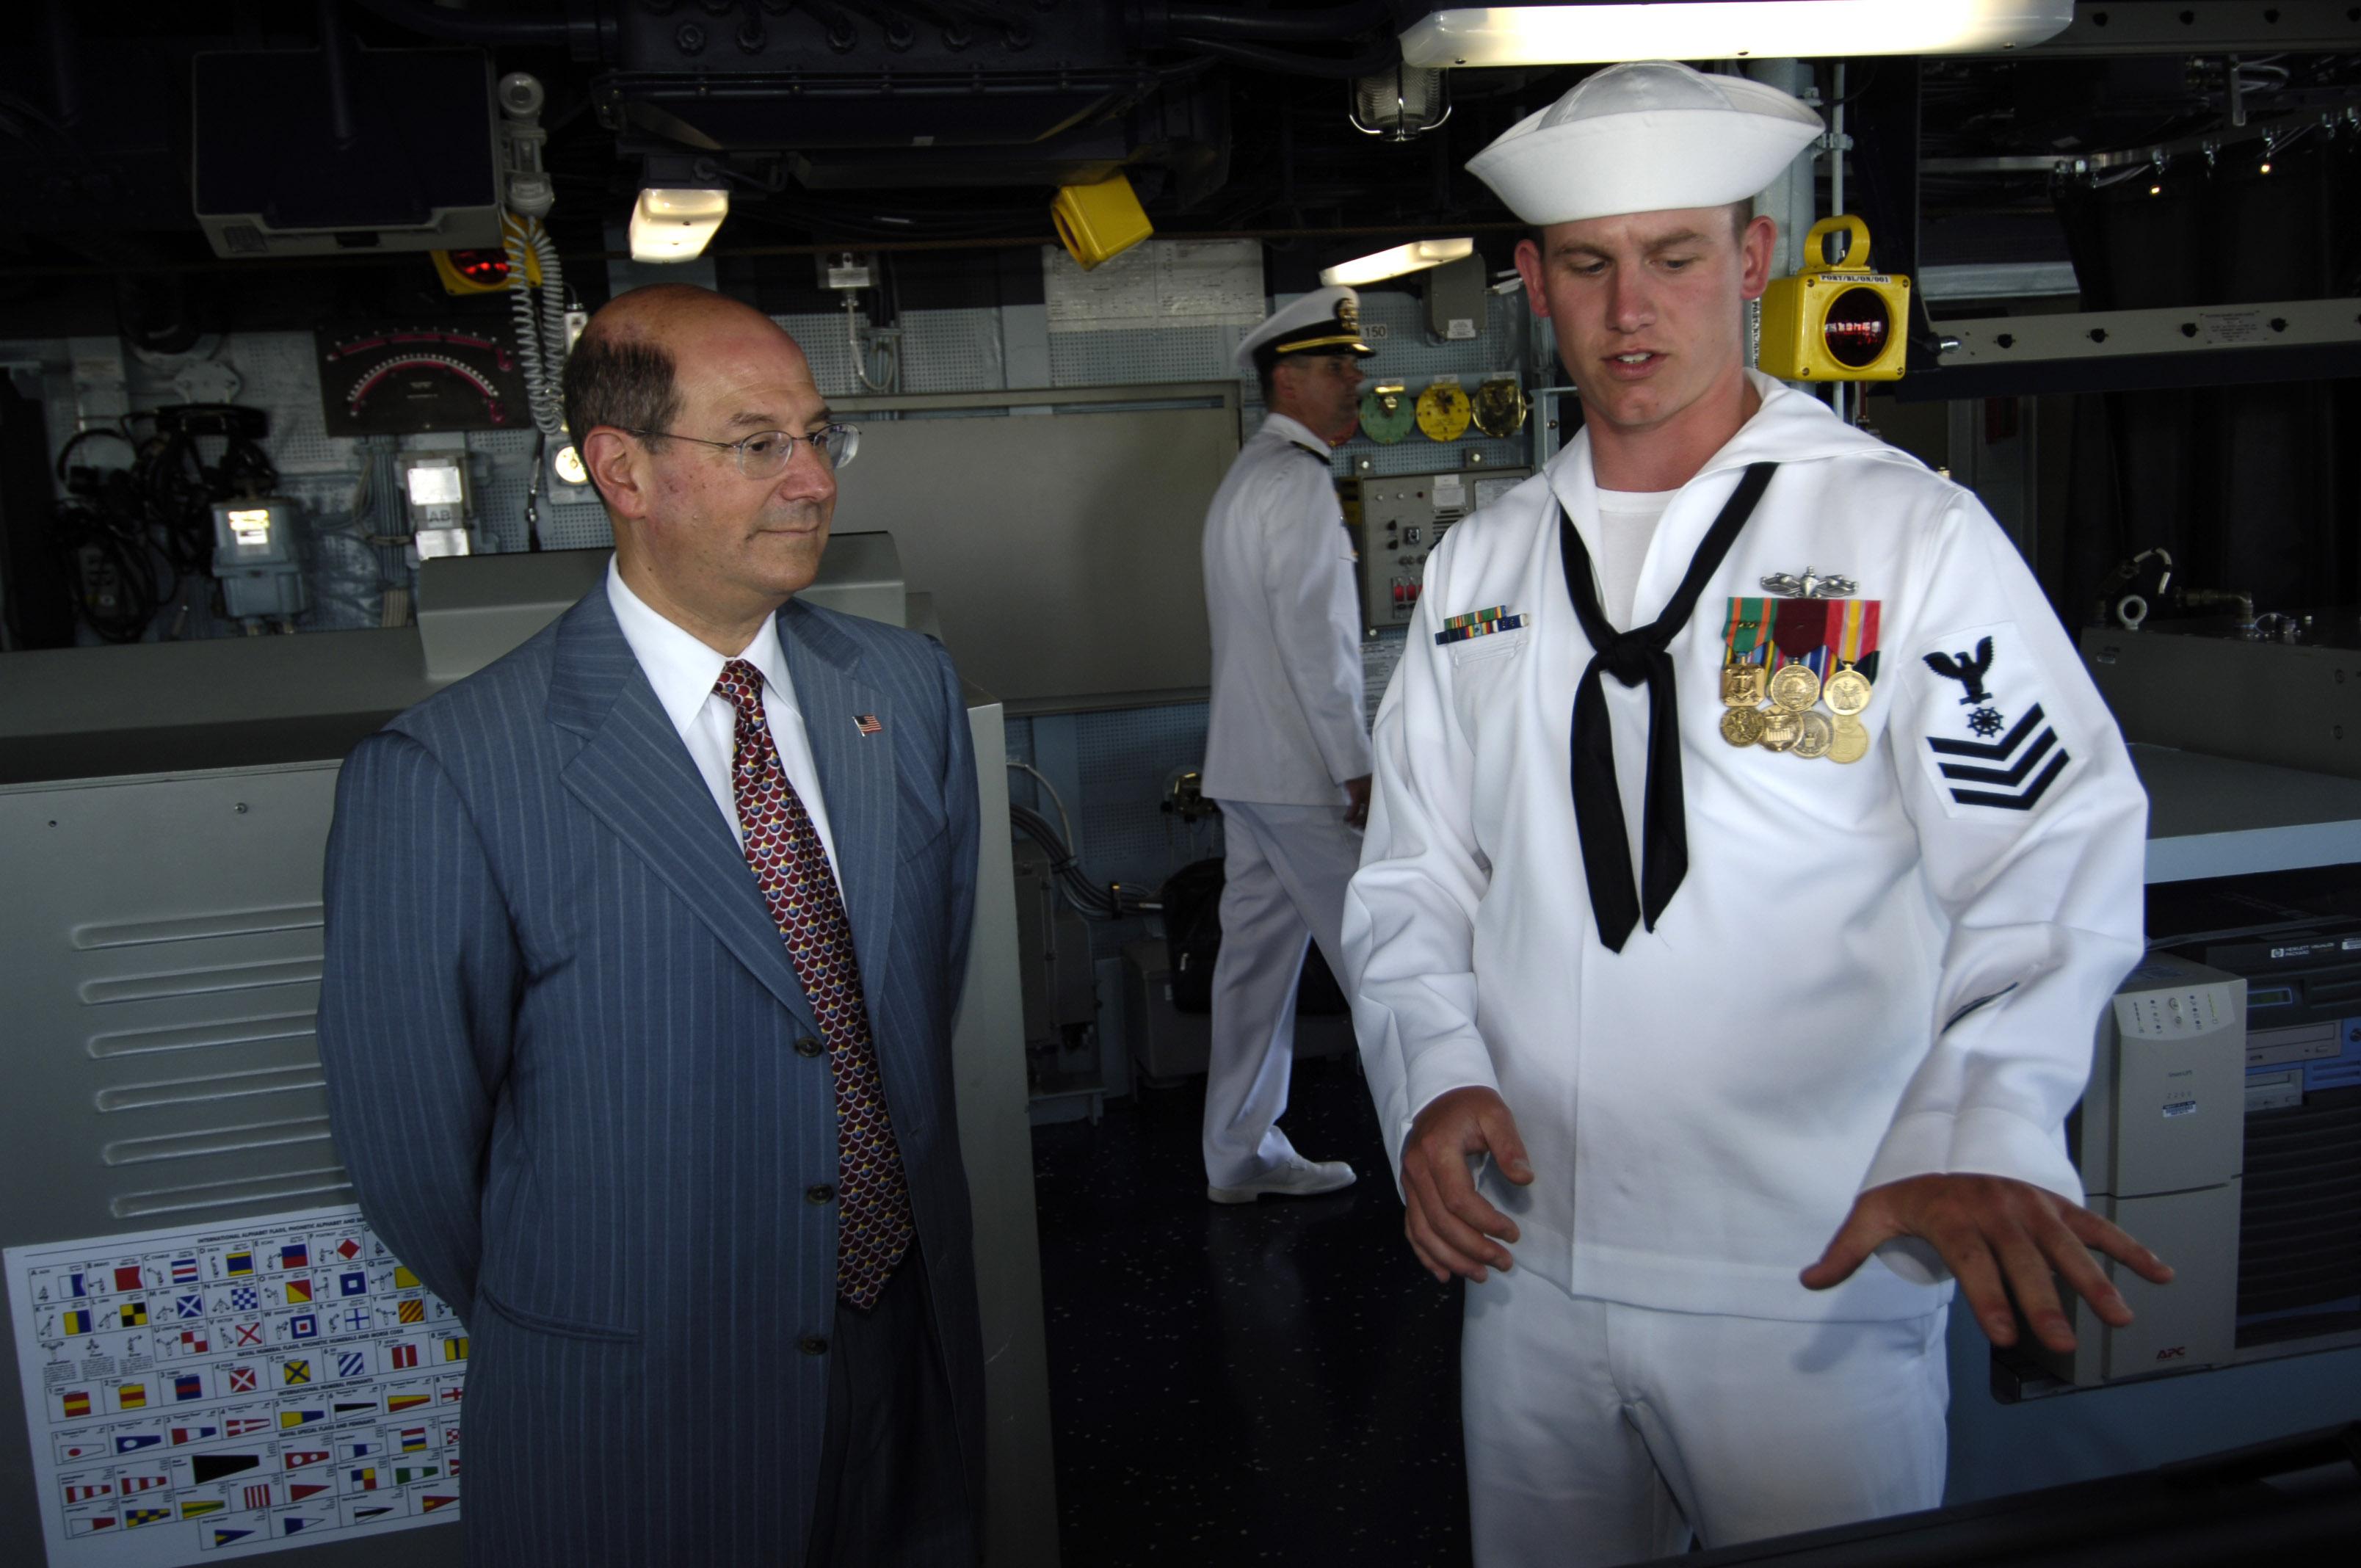 fileus navy 060610 n 3642e 005 quartermaster 1st class joshua manuel